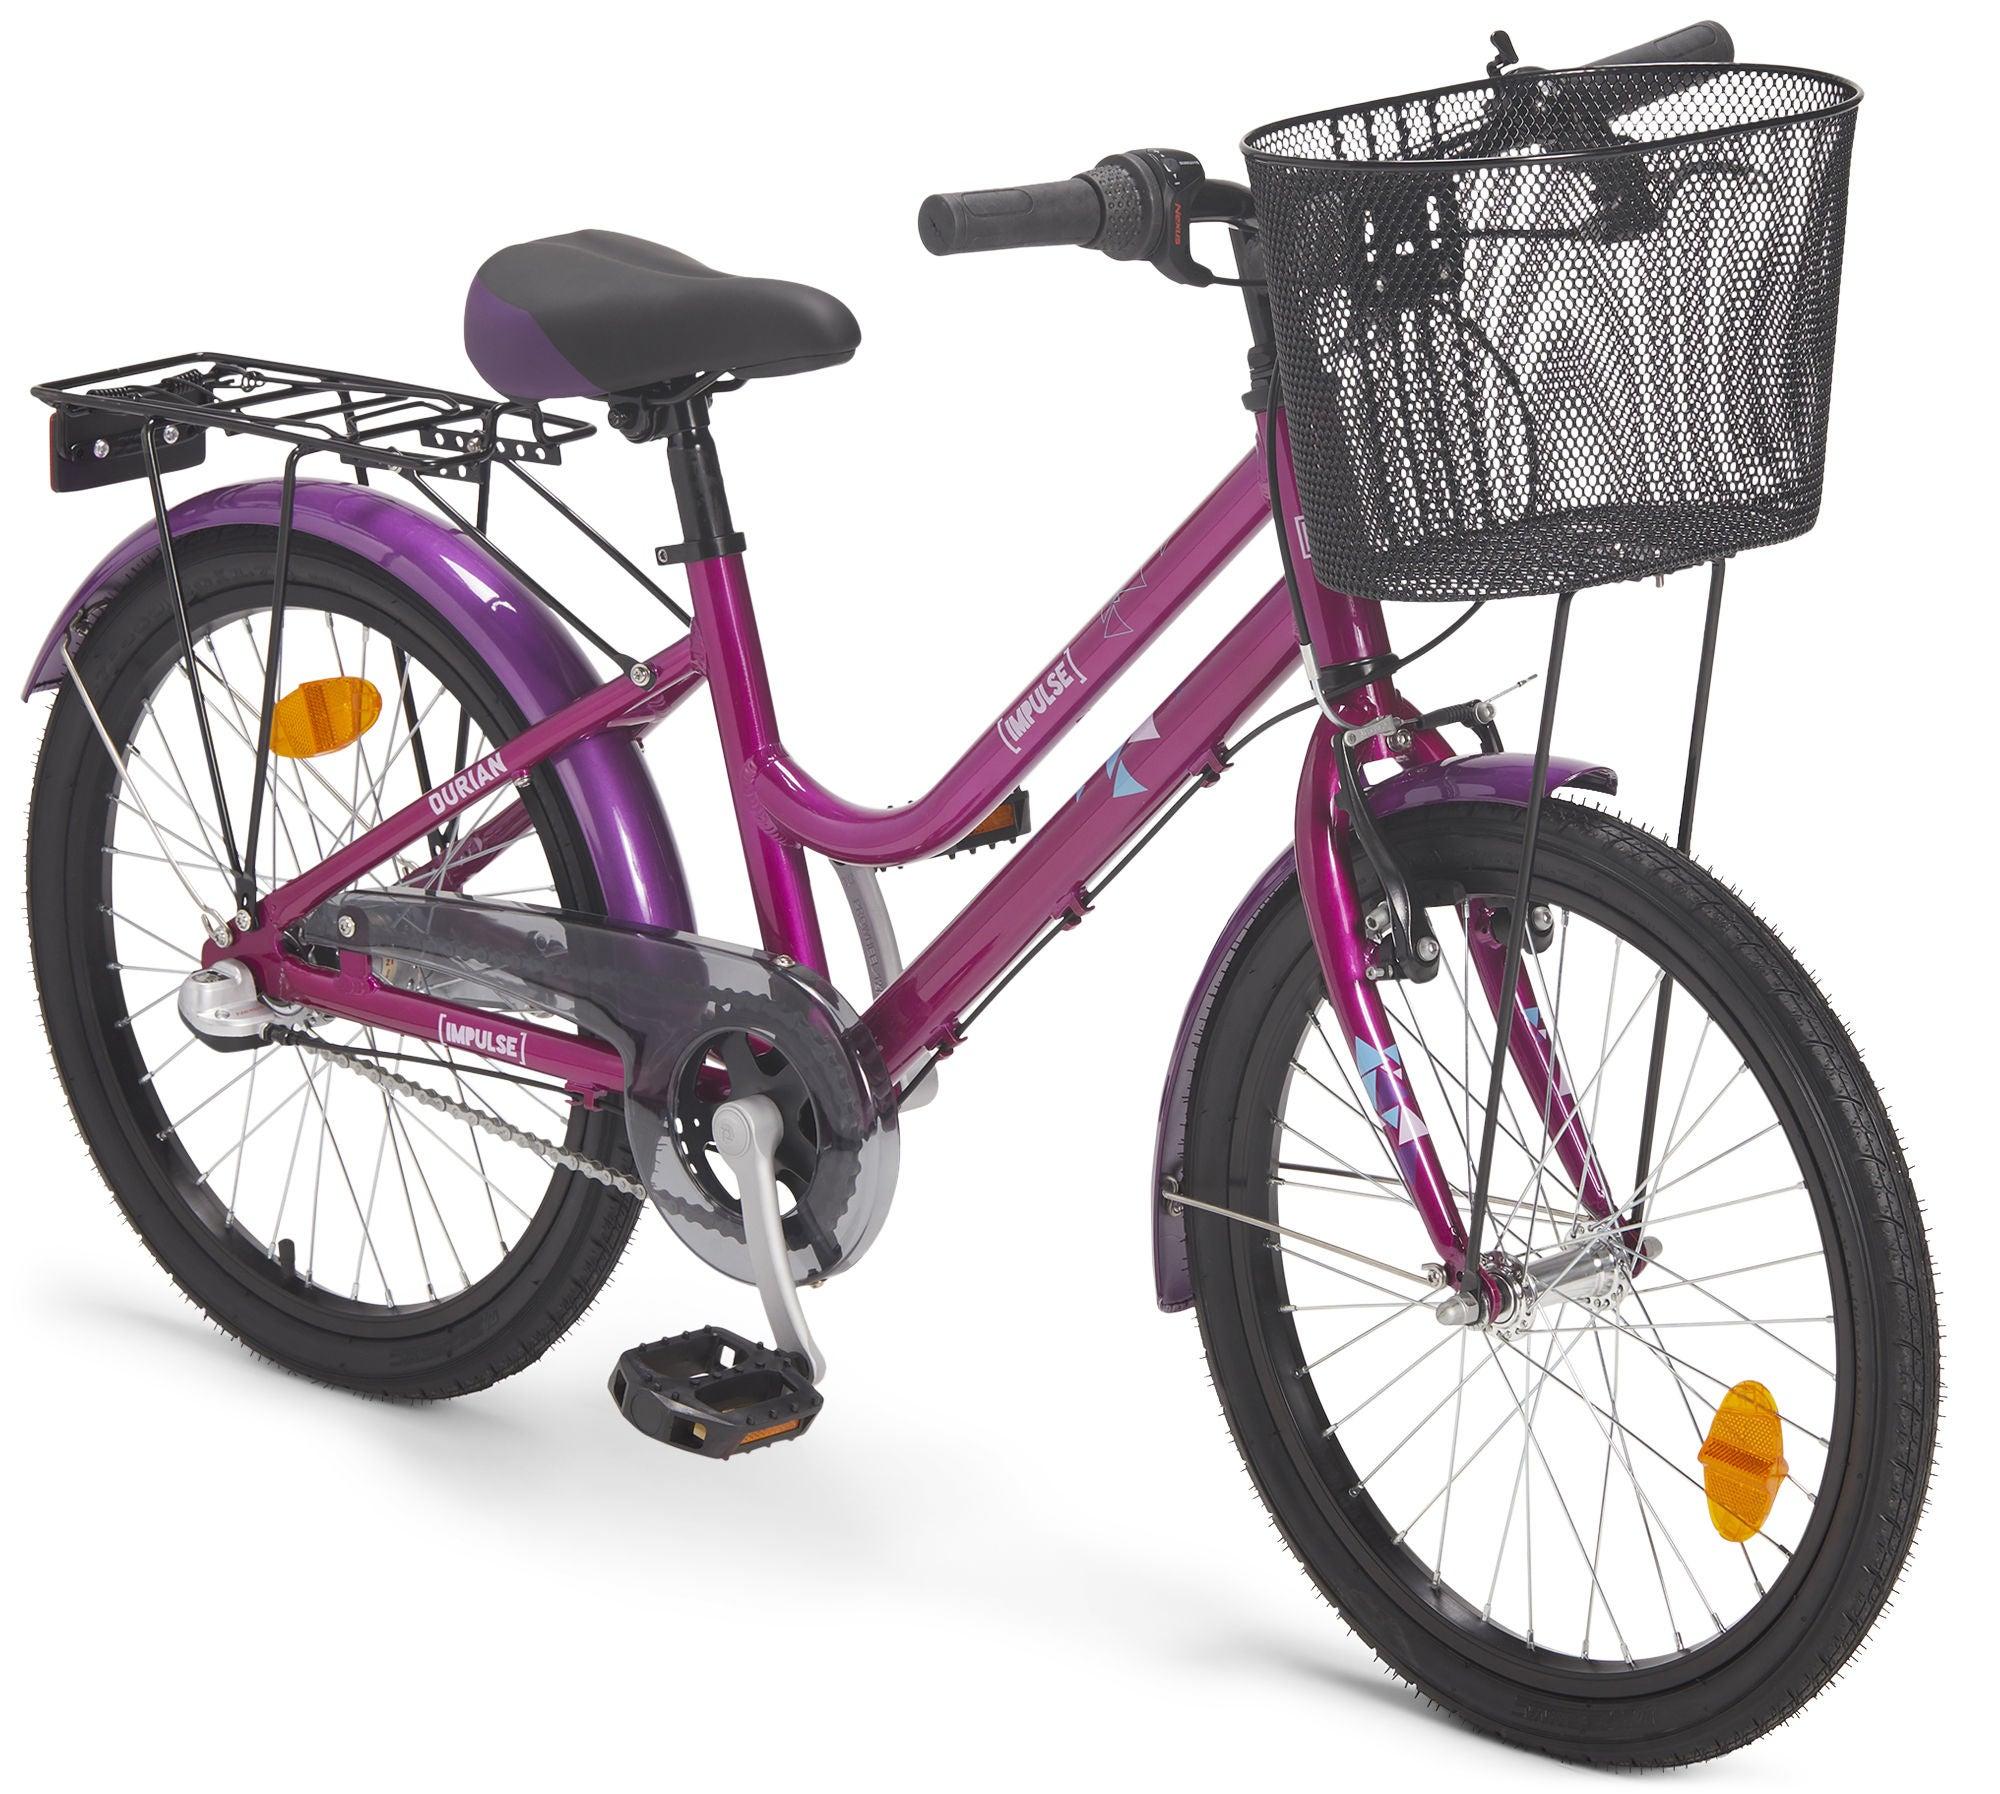 Køb Impulse Premium Durian Juniorcykel 20 Tommer, Pink/Purple | City